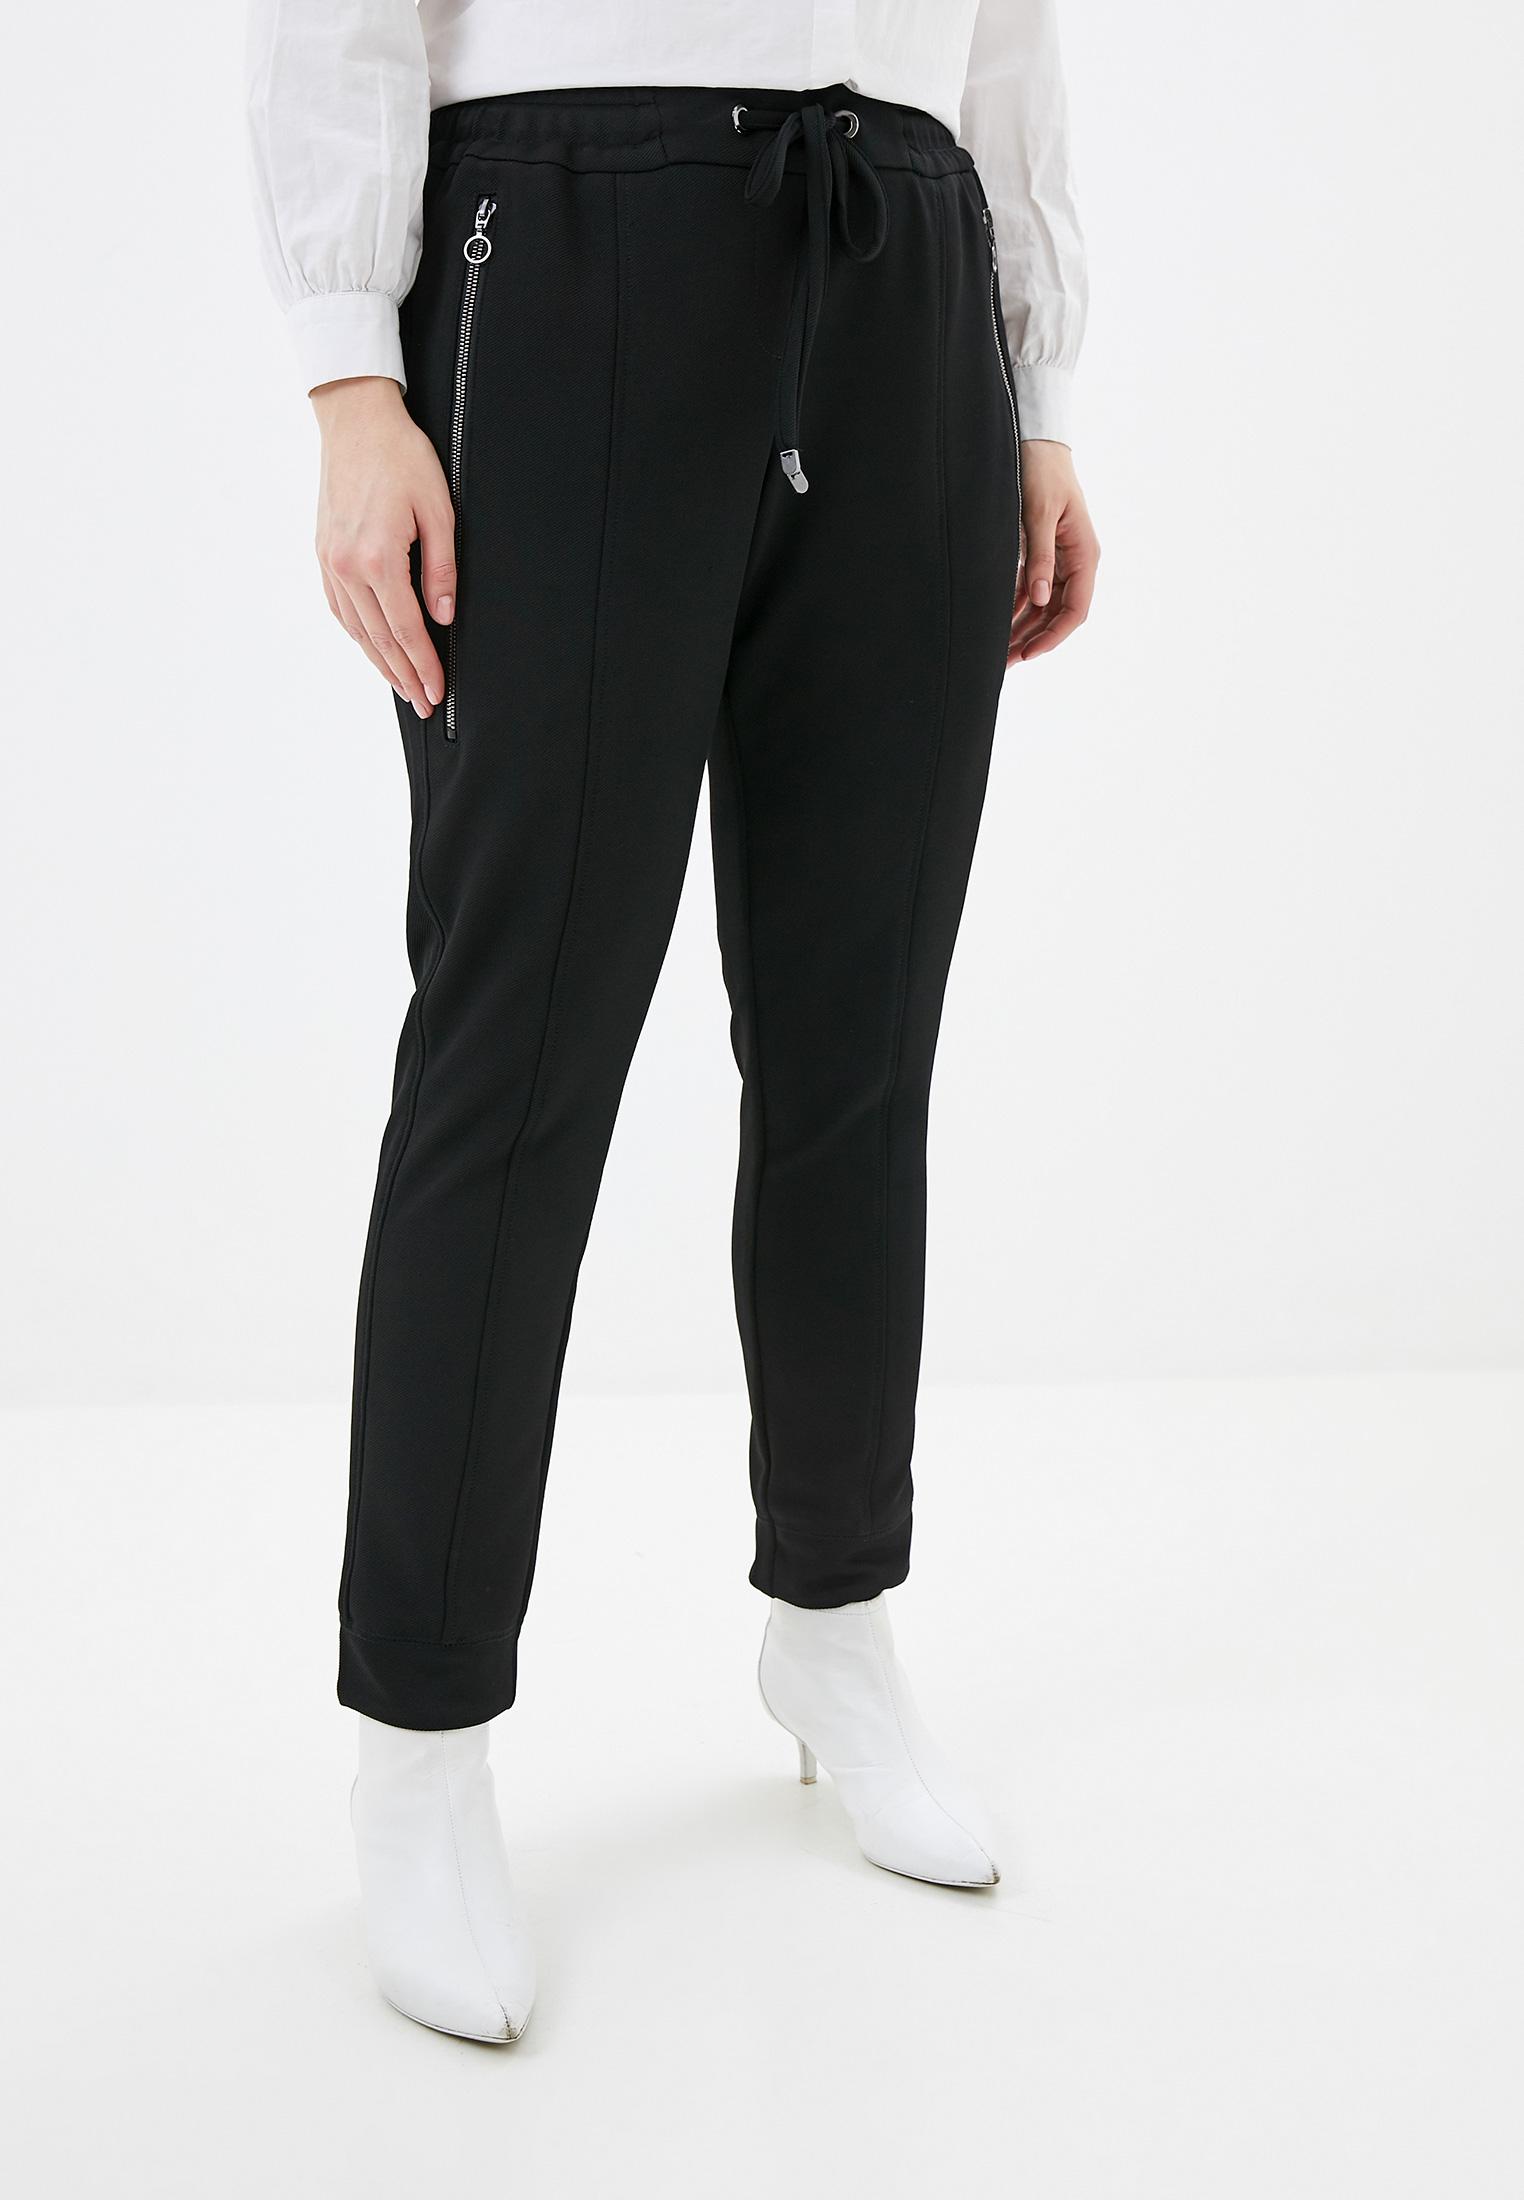 Женские зауженные брюки Betty Barclay 6076/1409